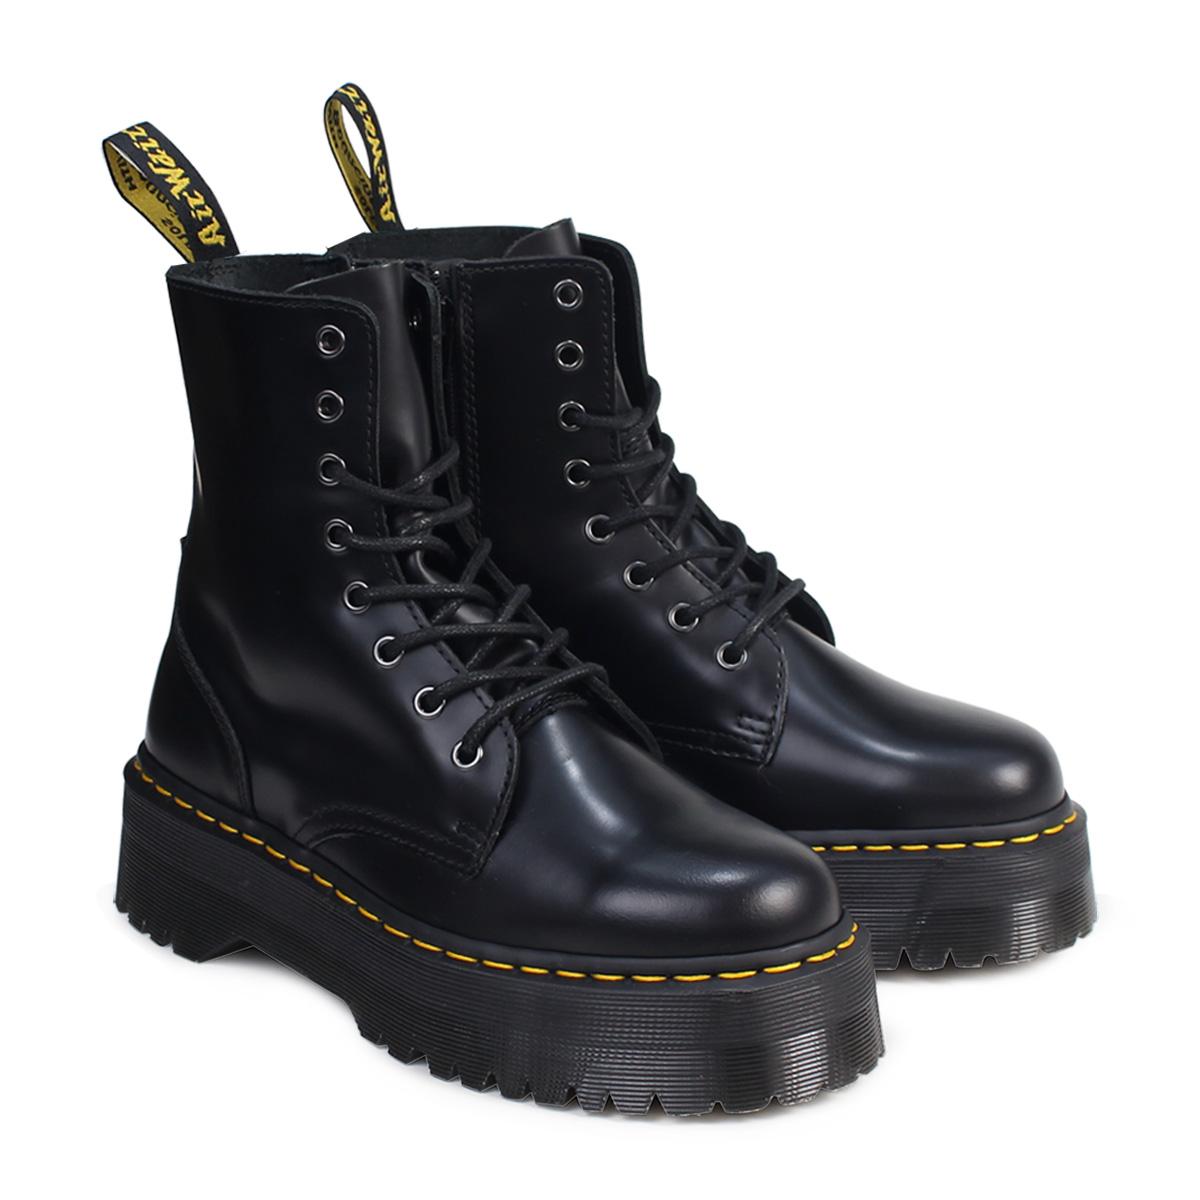 d0e23981188f Dr. Martens Dr.Martens 8 hole boots JADON leather mens Womens R15265001  black unisex  regular